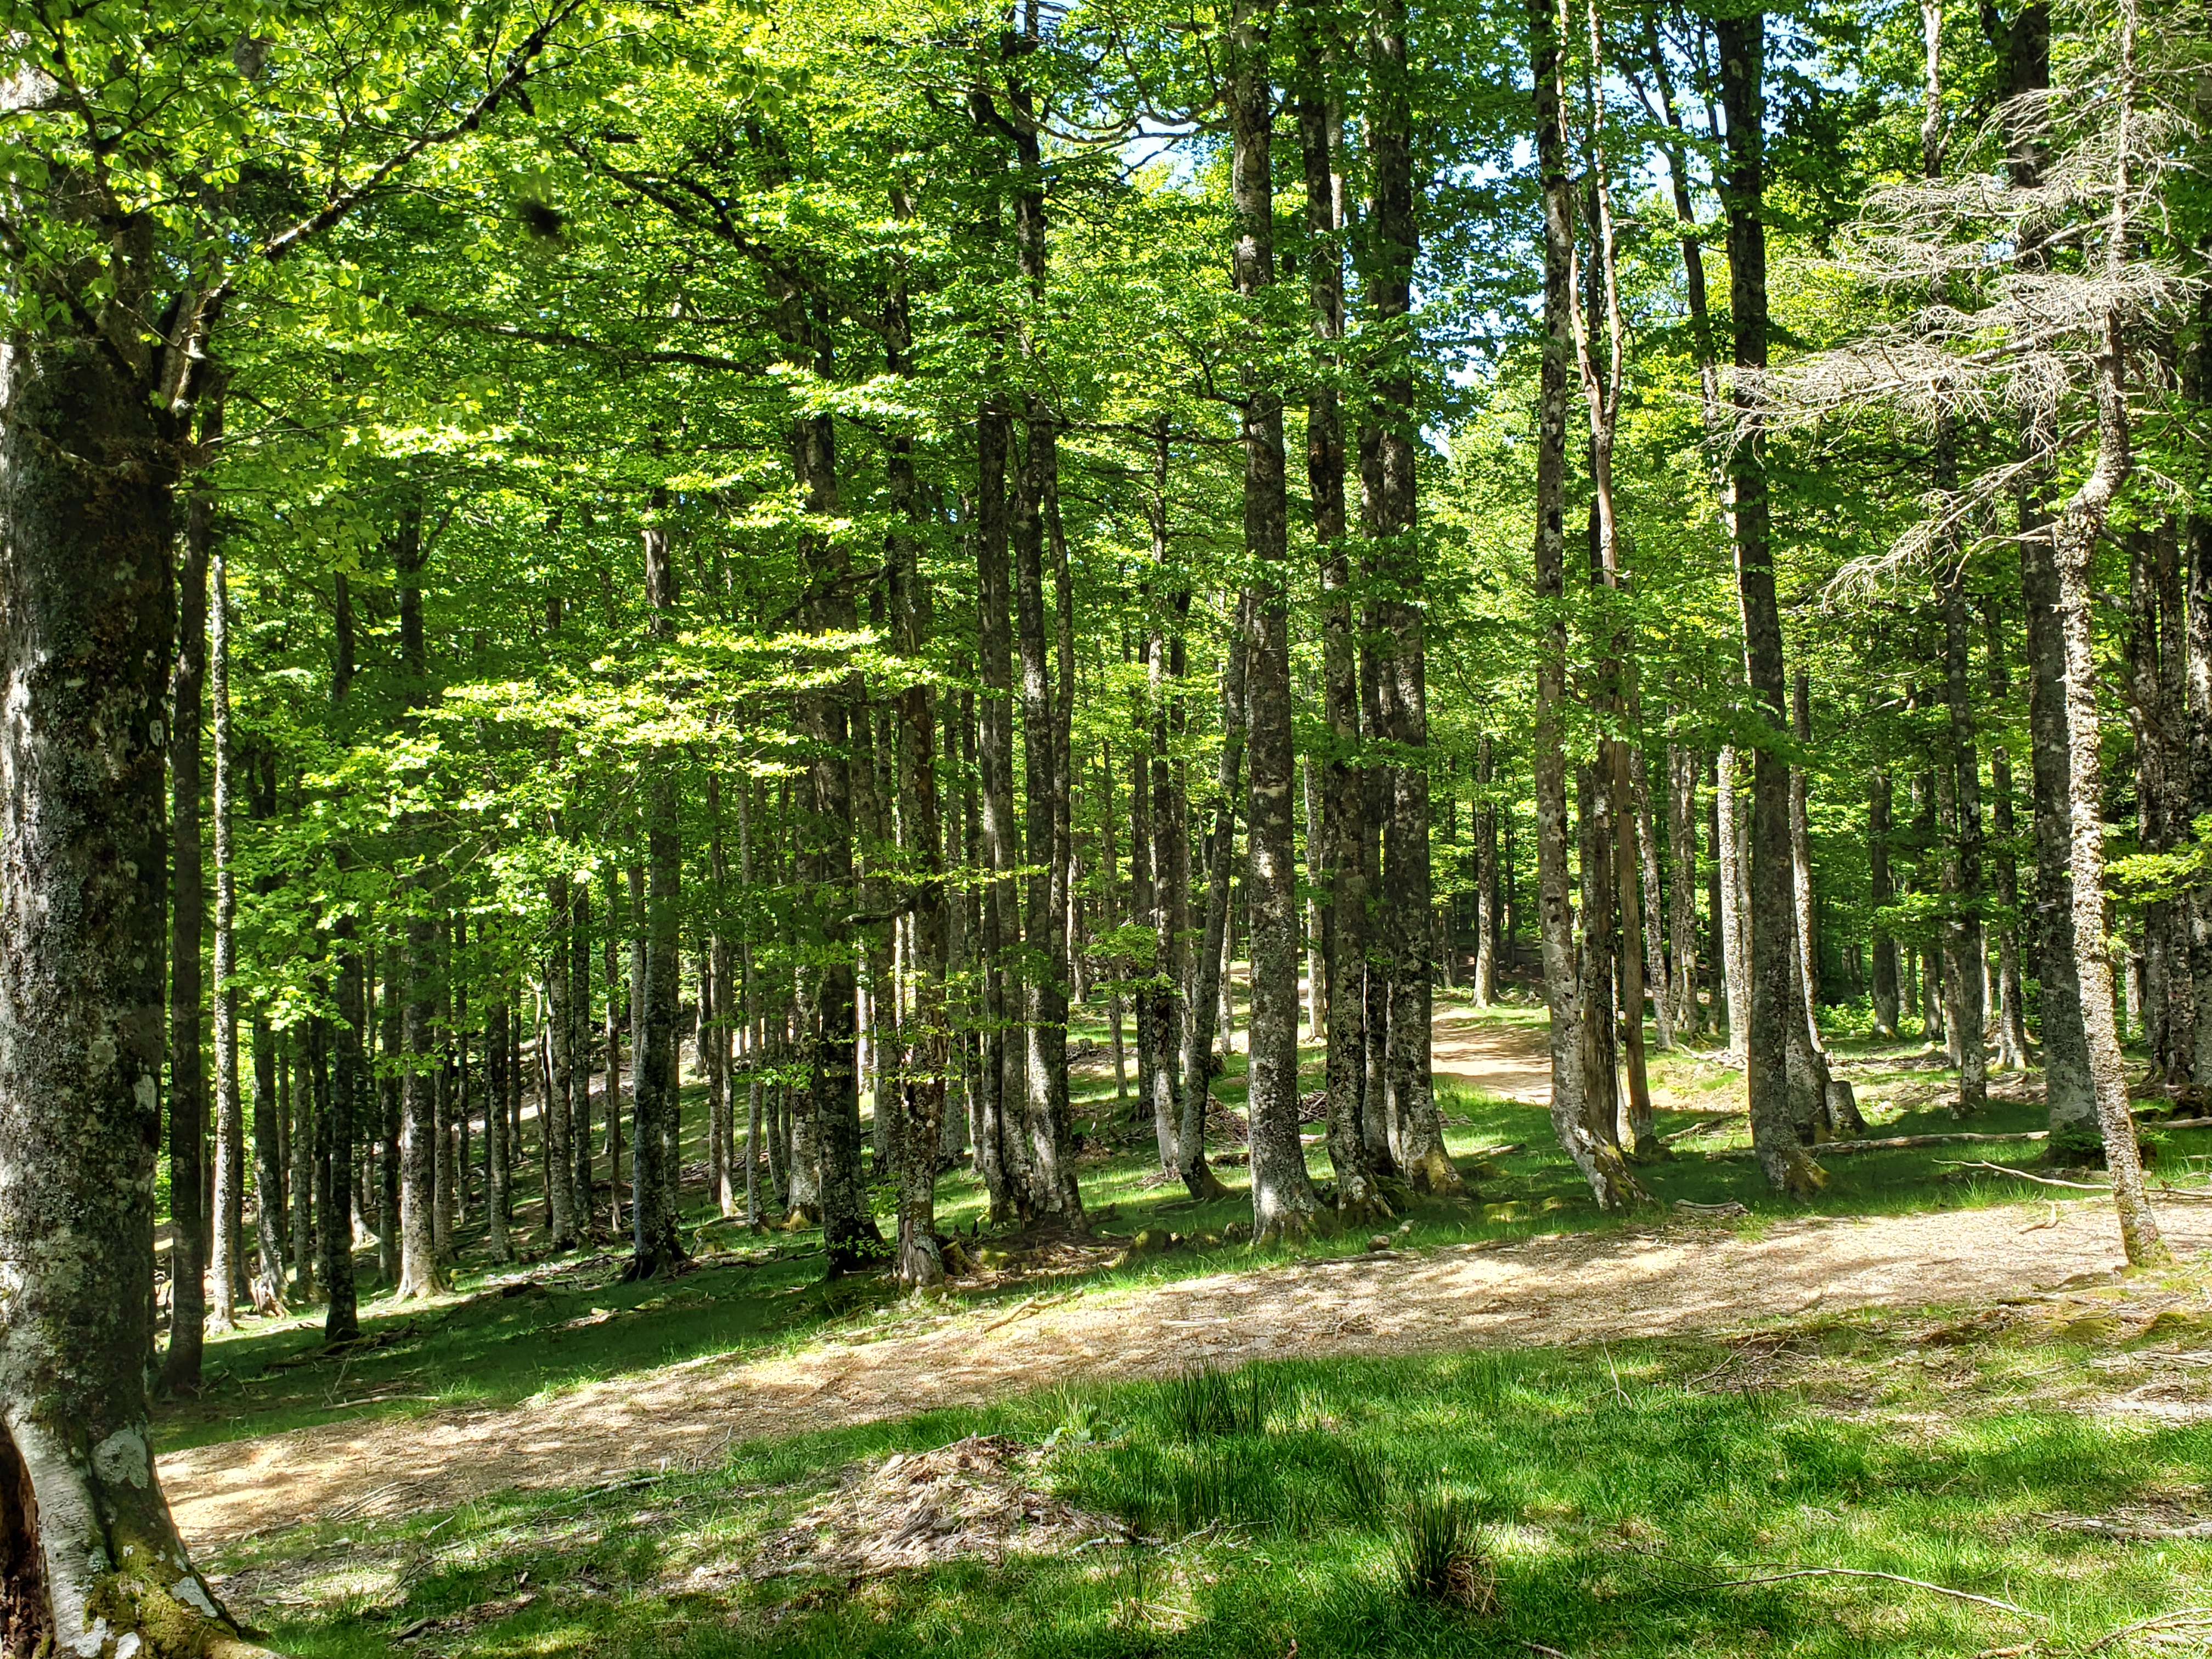 randonnée Pays Basque forêt Iraty